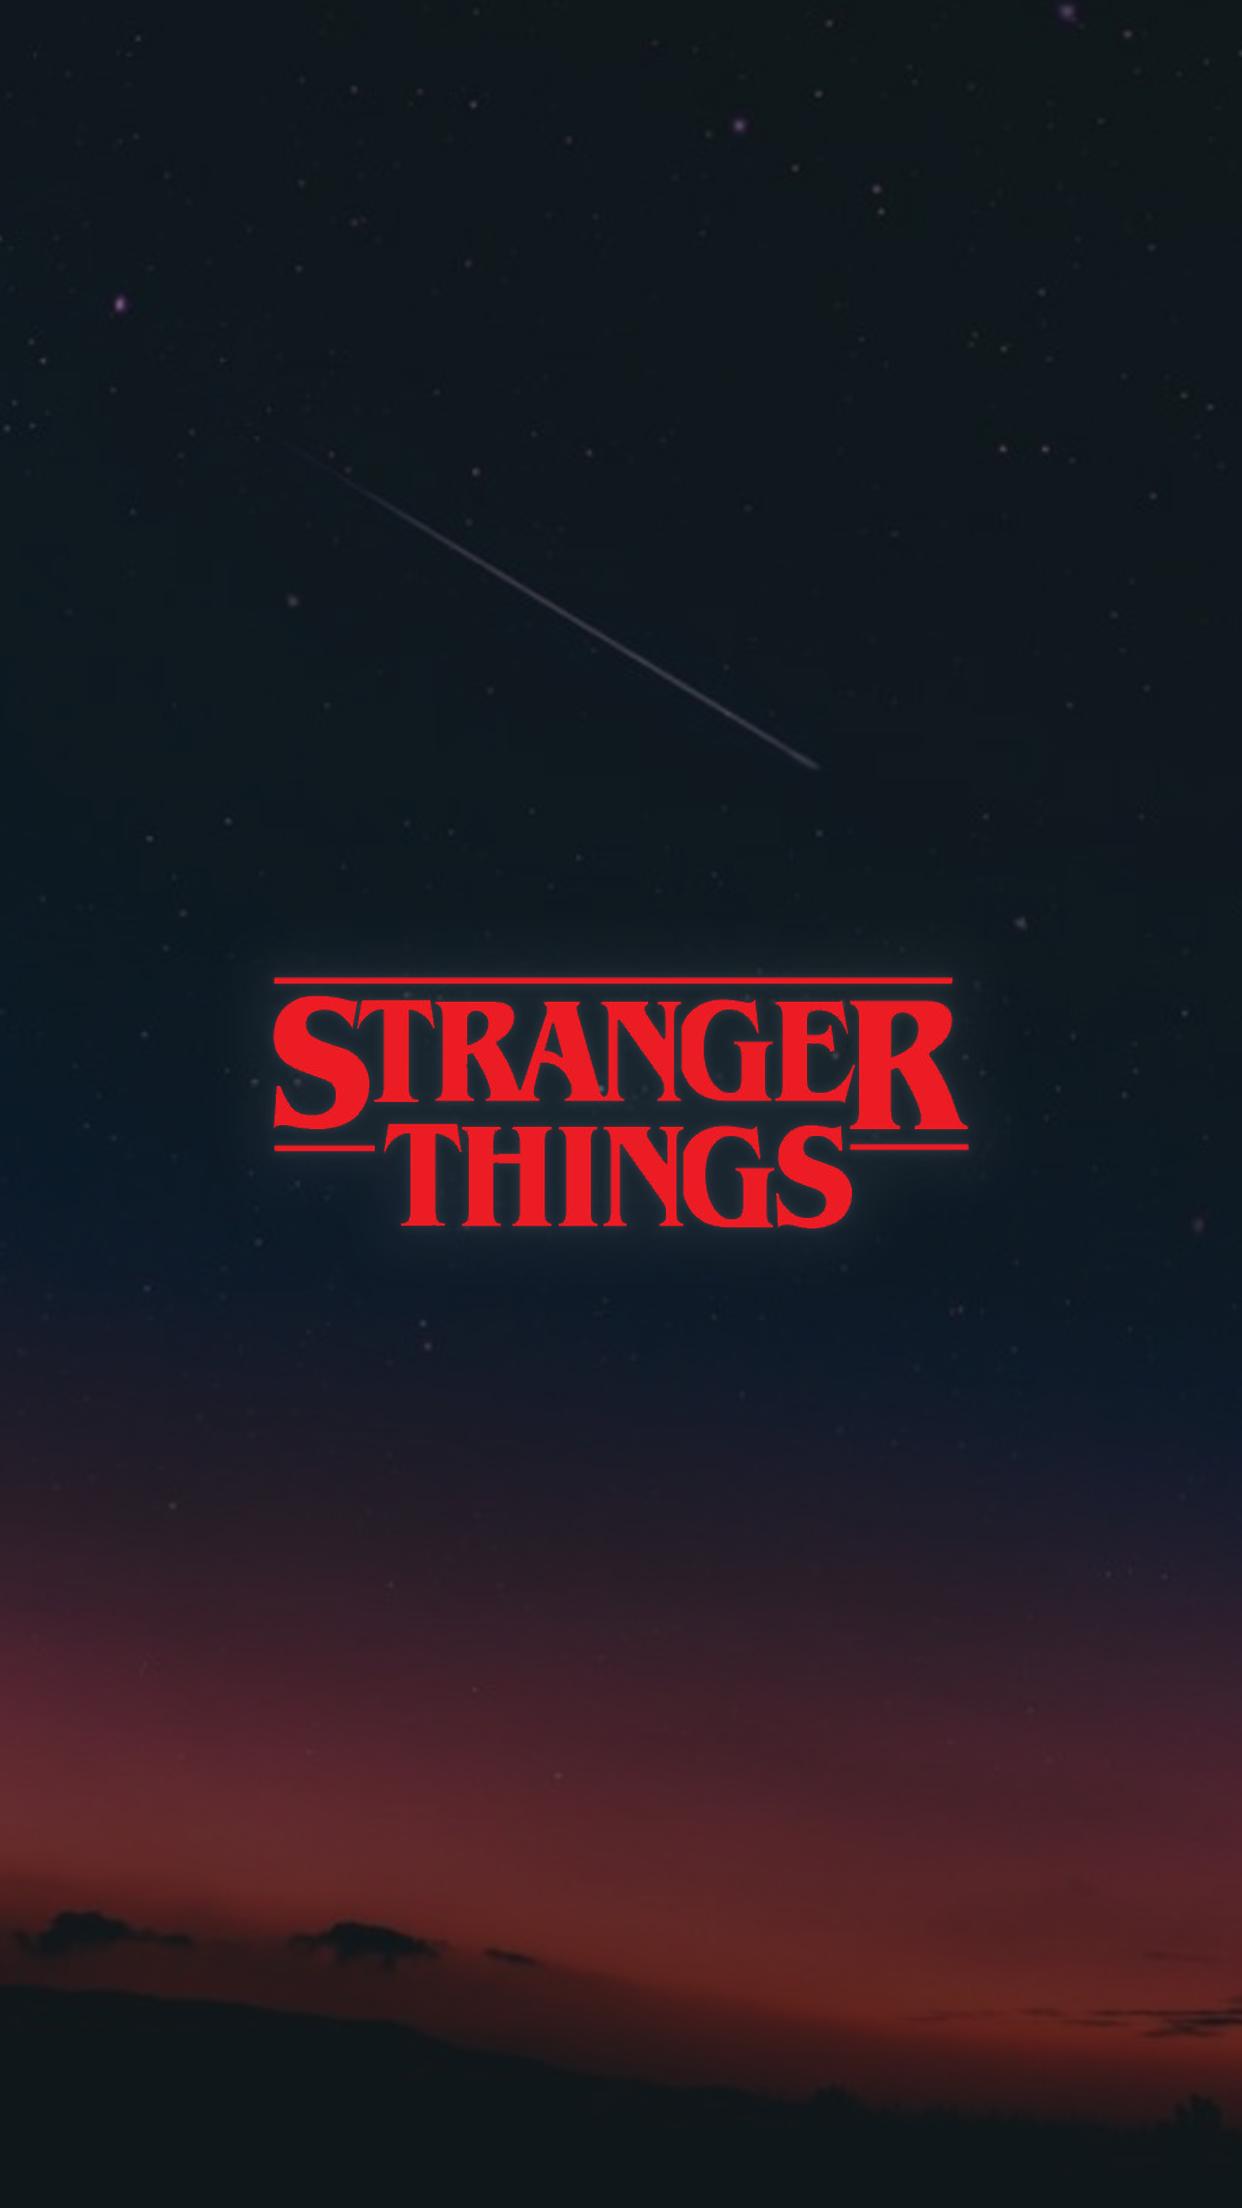 Stranger Things Wallpaper Iphone Wallpaper Stranger Things Stranger Things Wallpaper Stranger Things